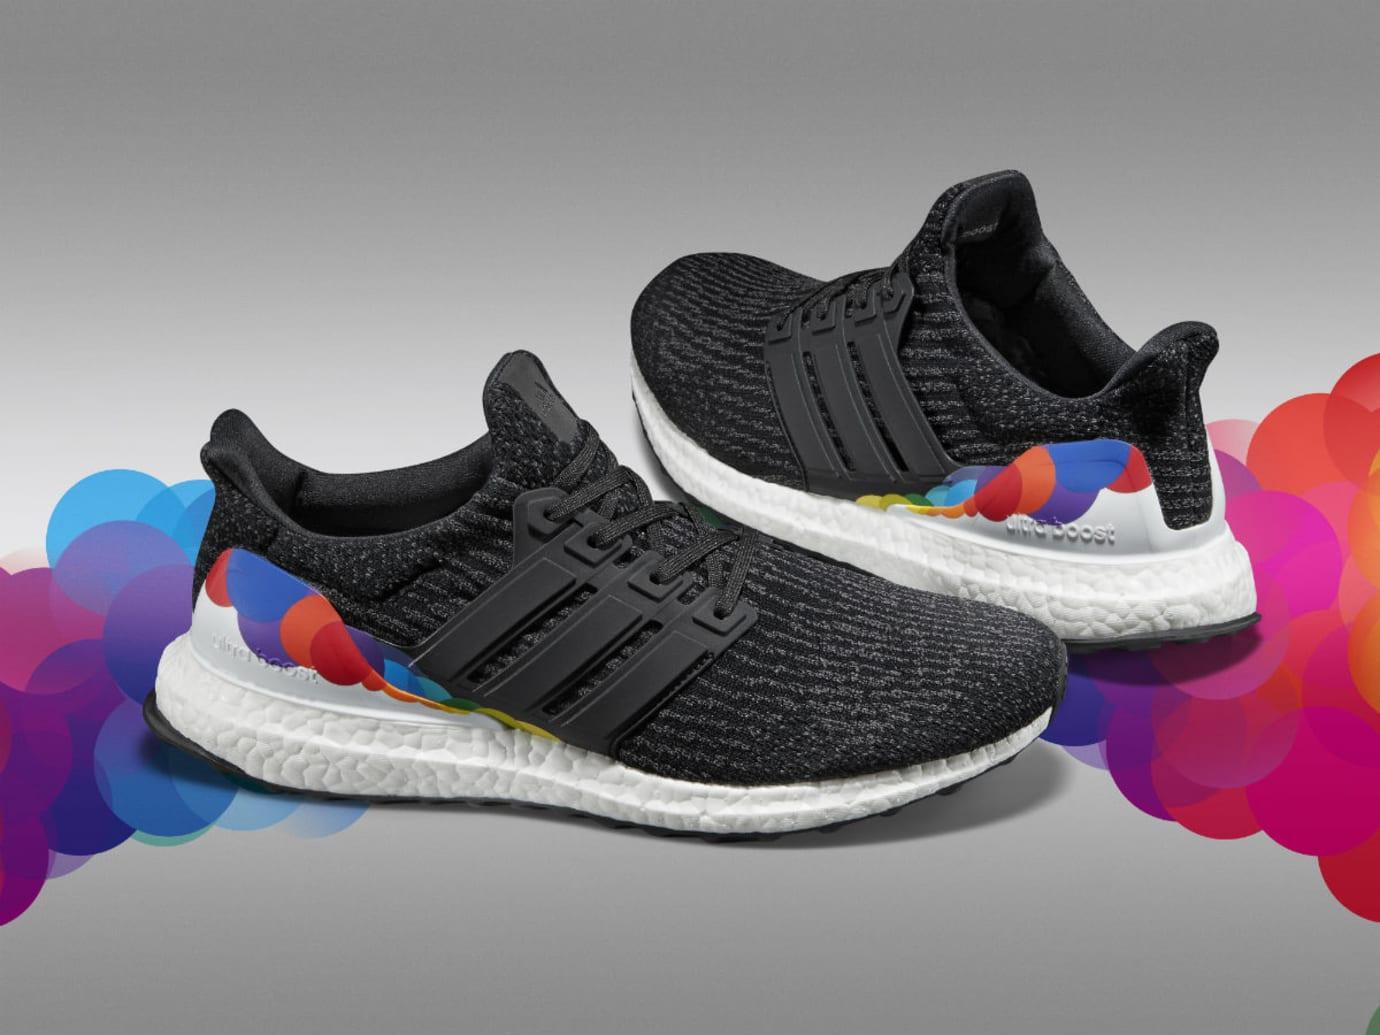 Adidas Pride Pack Ultra Boost Release Date